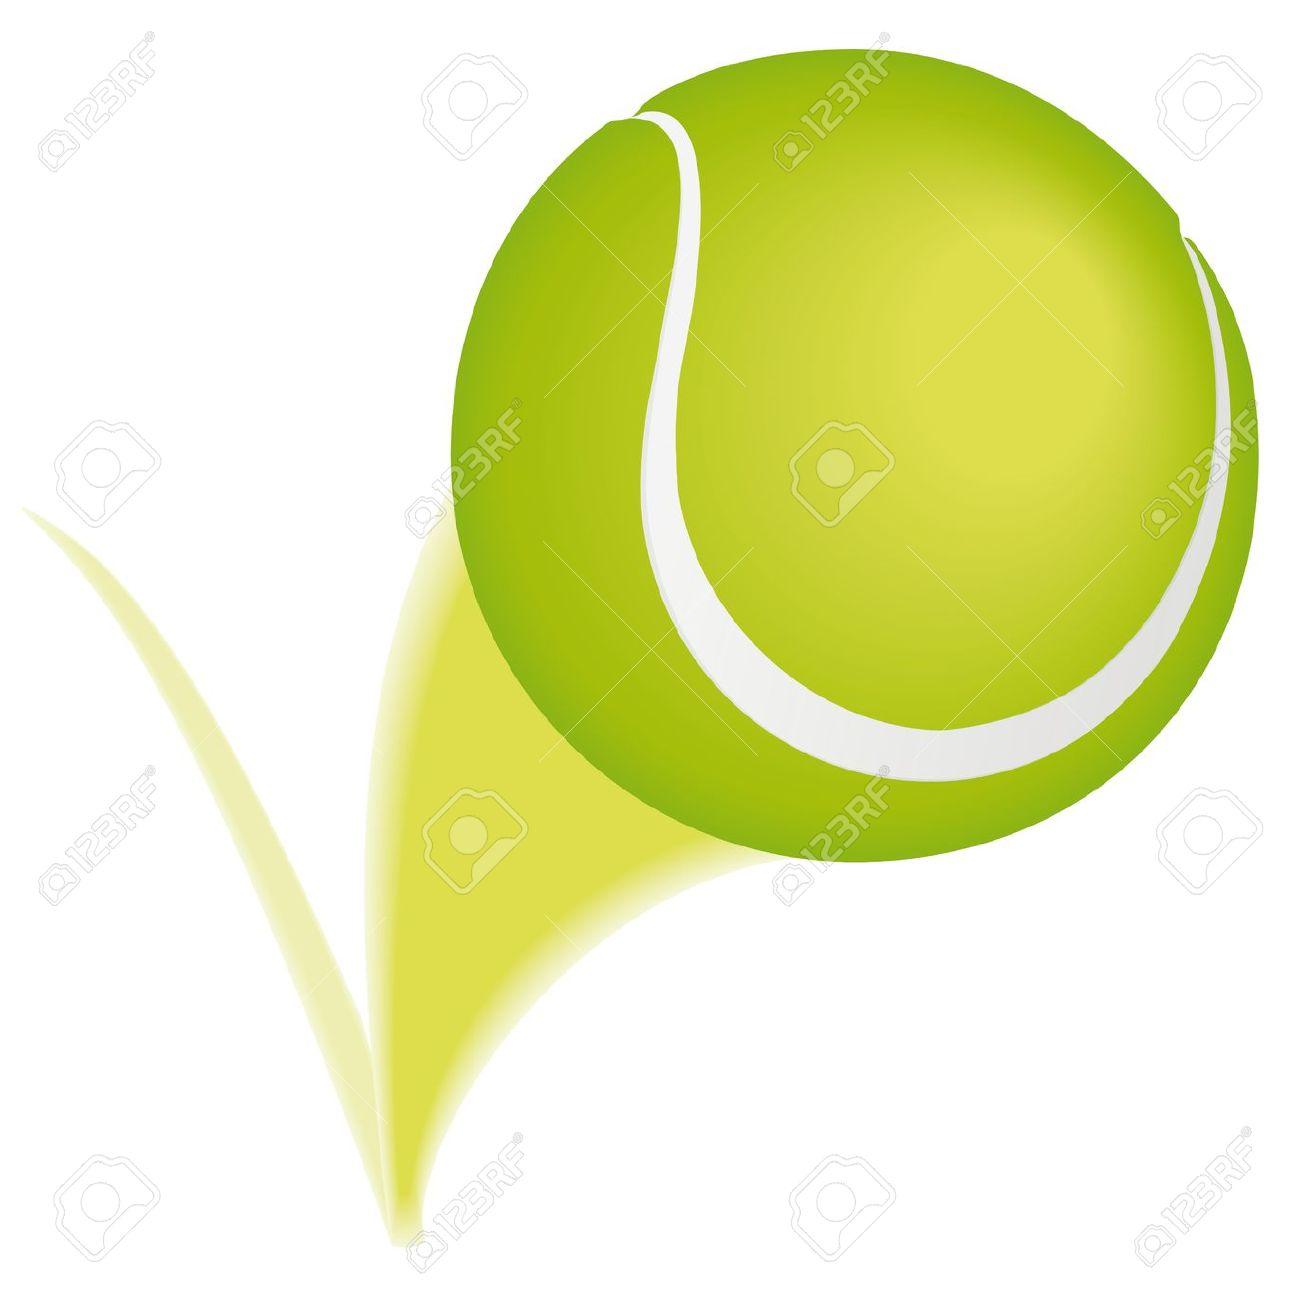 1300x1300 Tennis Ball Clipart Animated